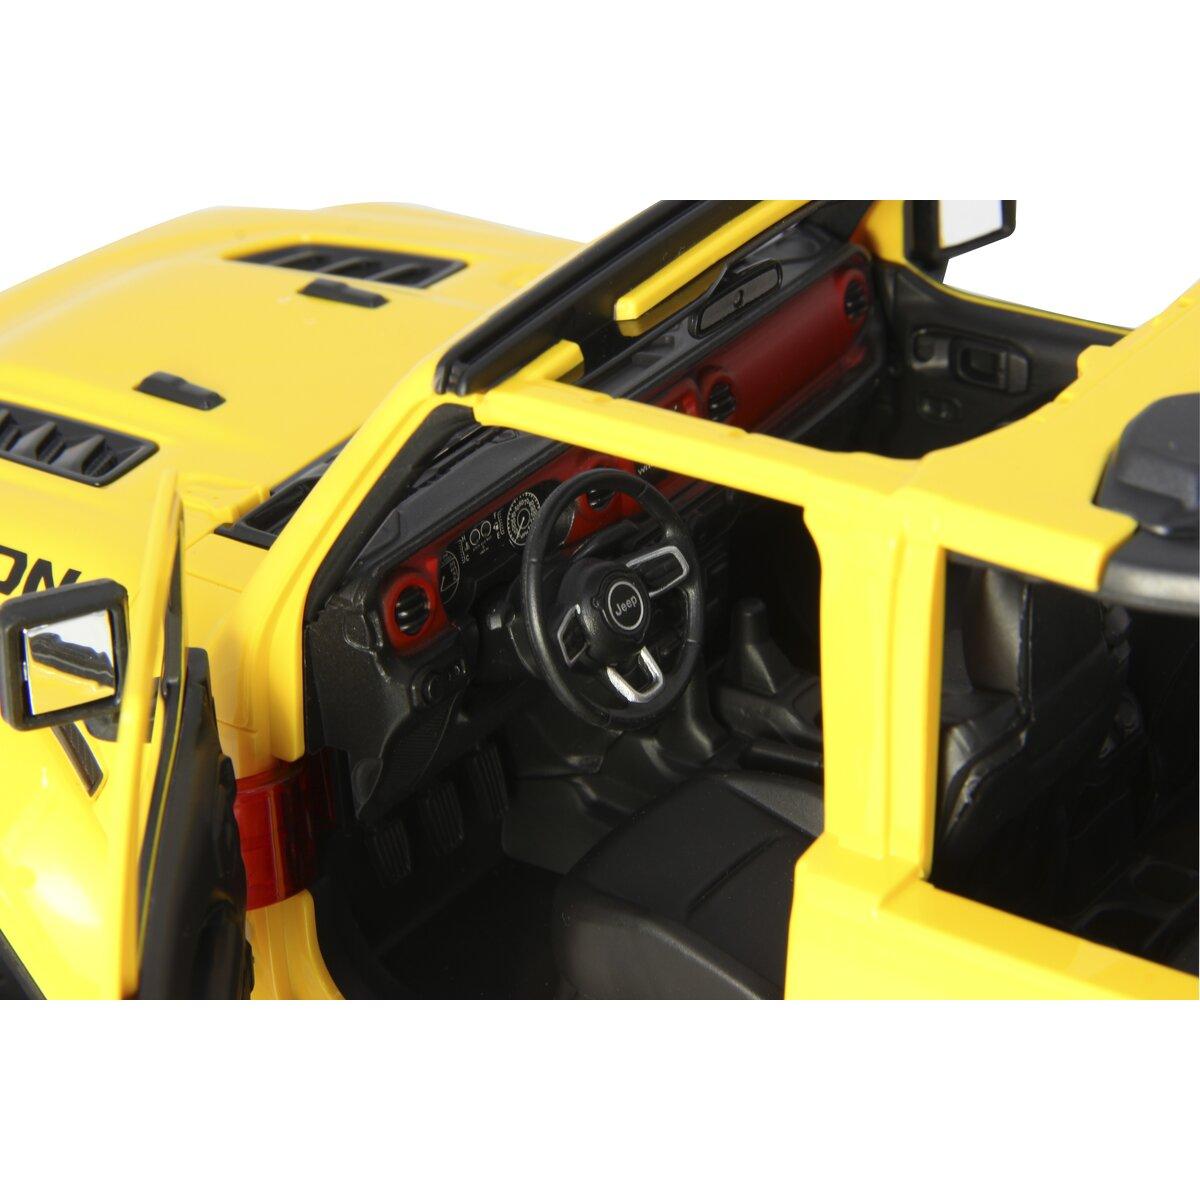 Jeep Wrangler JL 1:14 gelb 2,4GHz A